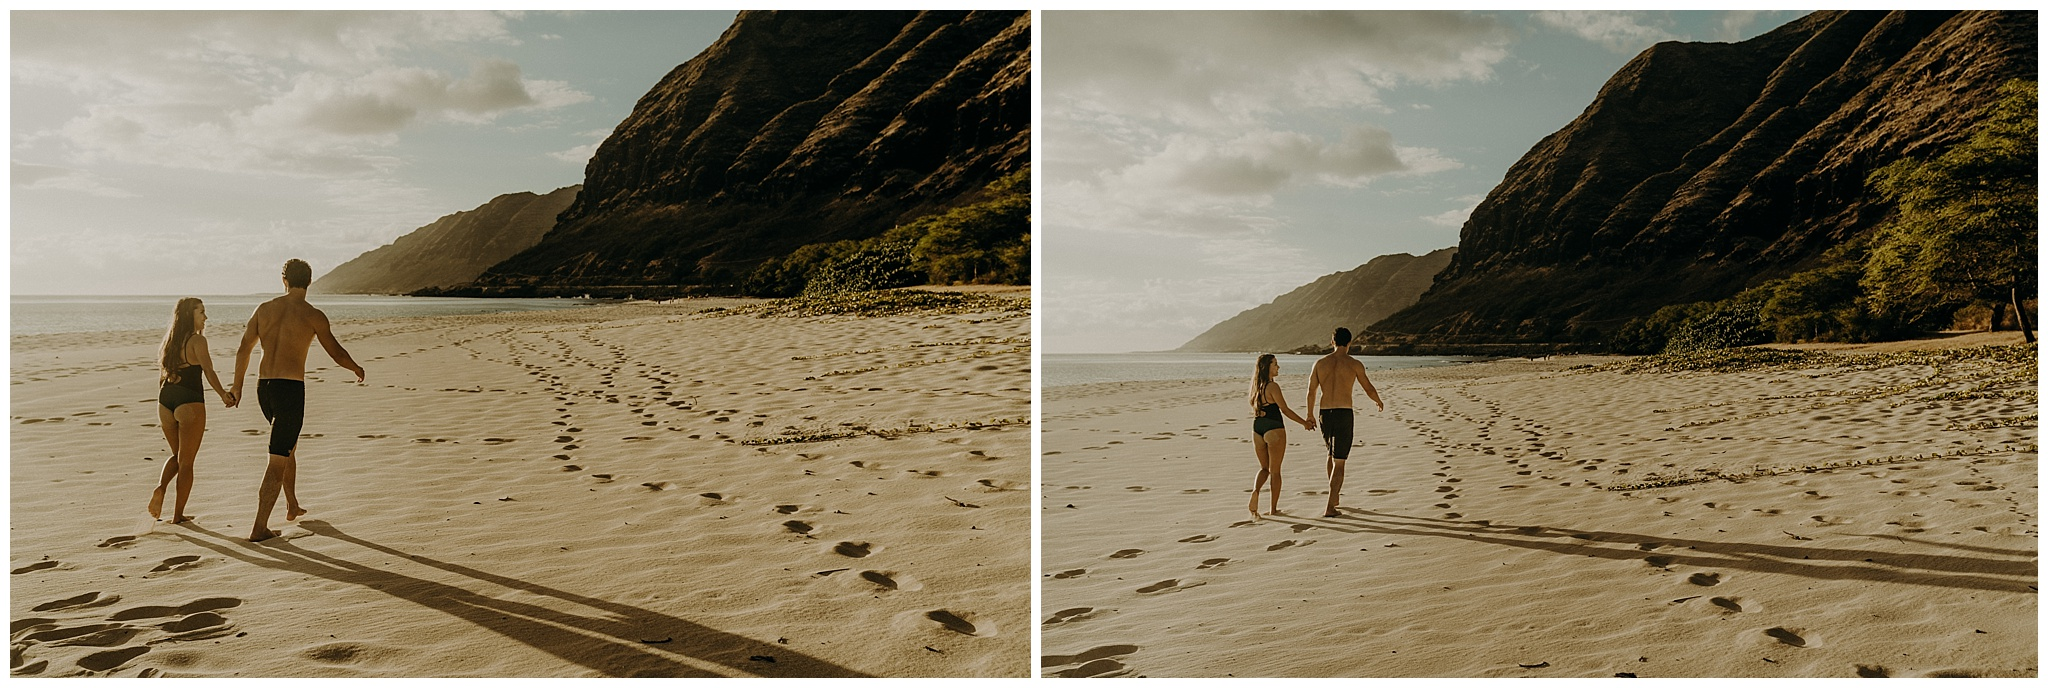 oahu-vacation-photographer1.jpg